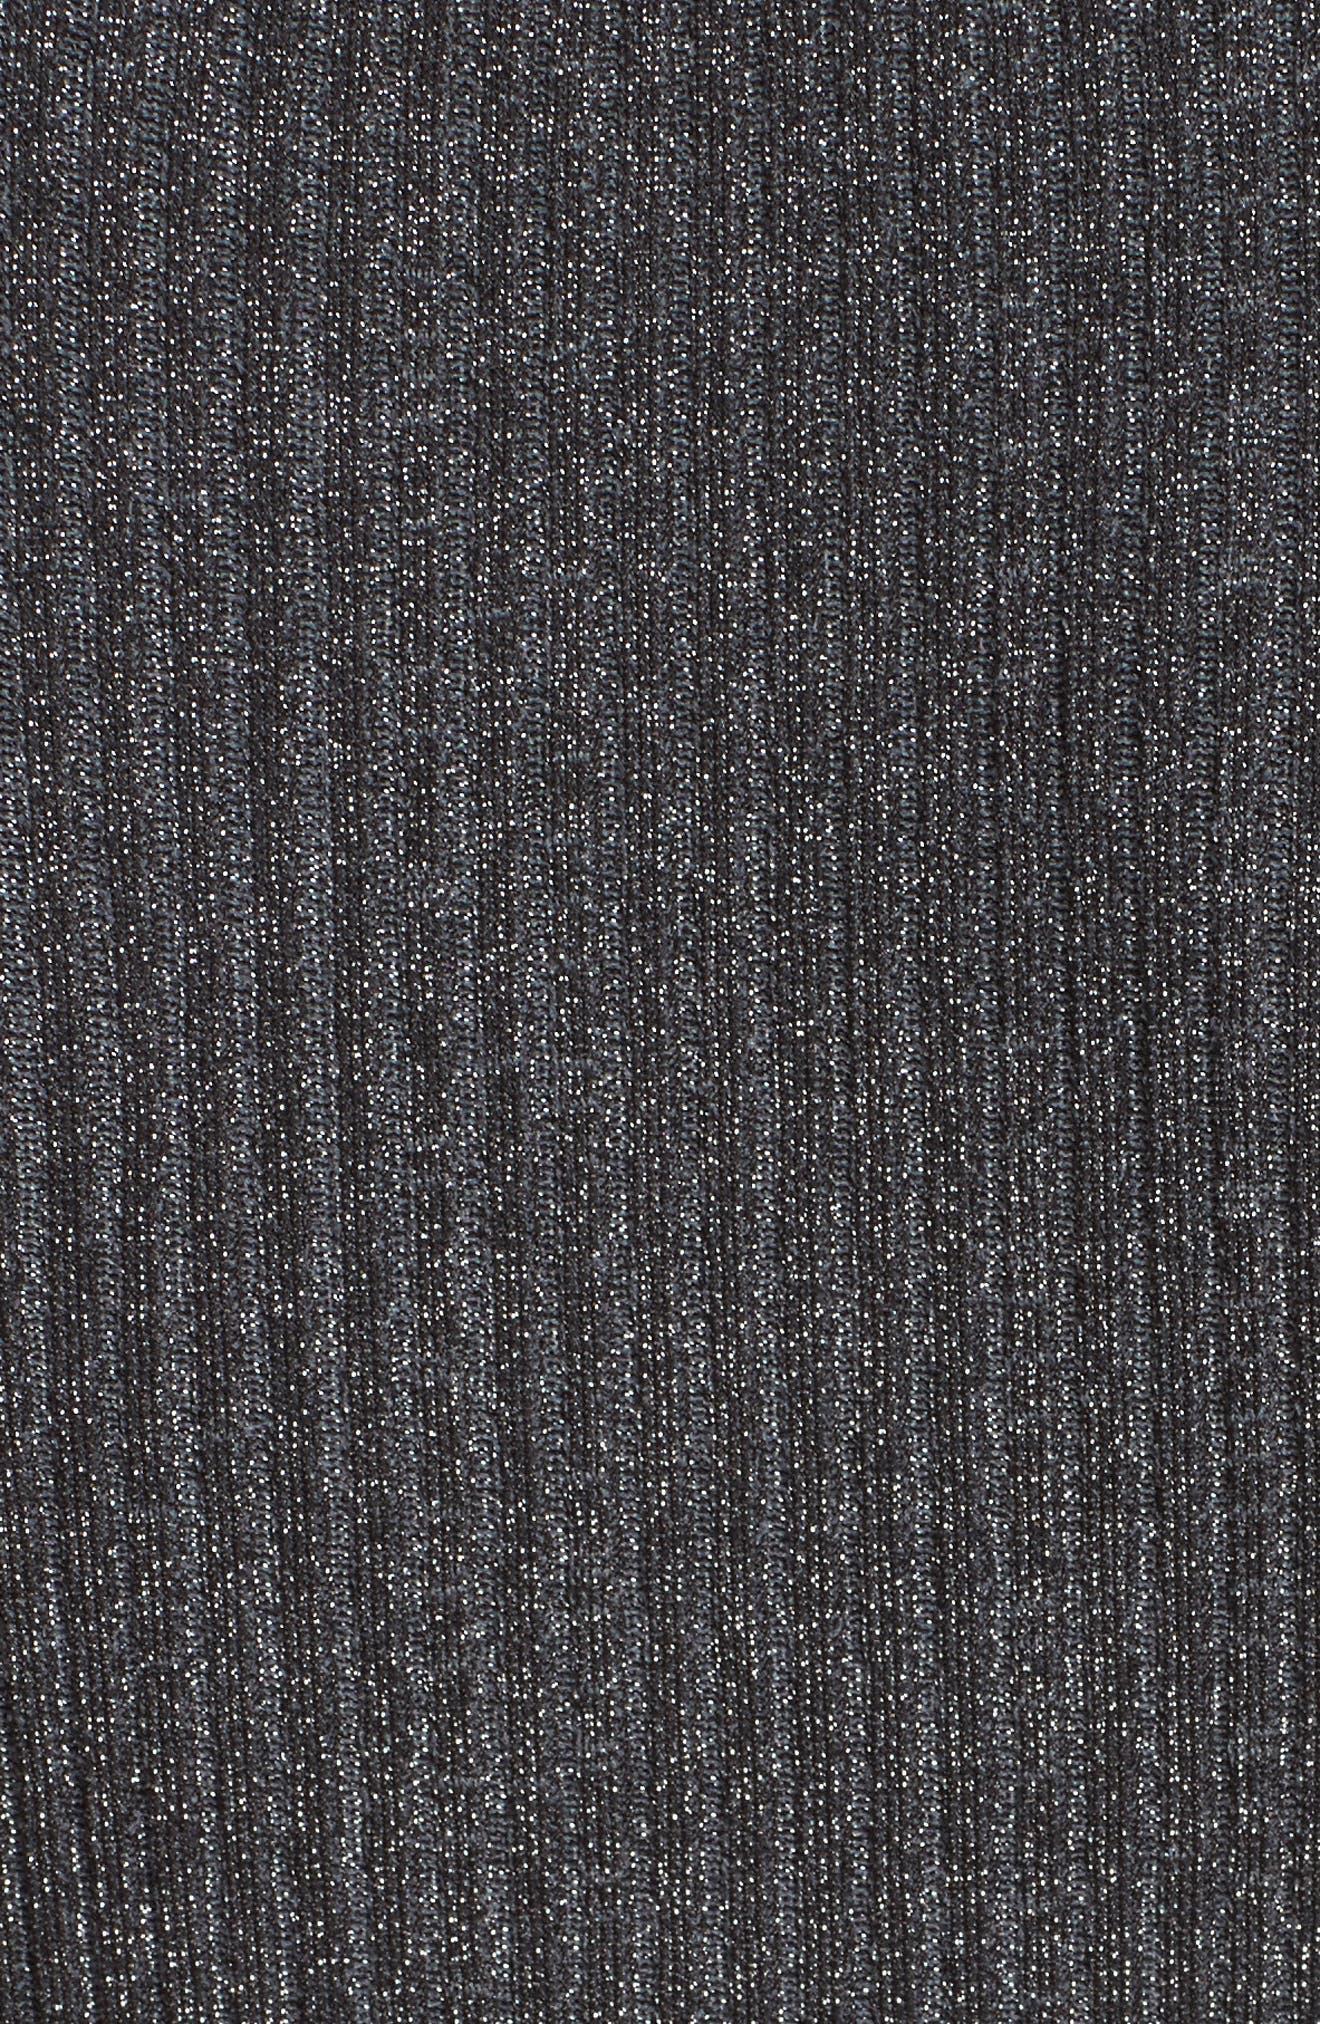 Stardust Rib Knit Sheath Dress,                             Alternate thumbnail 5, color,                             Gunmetal